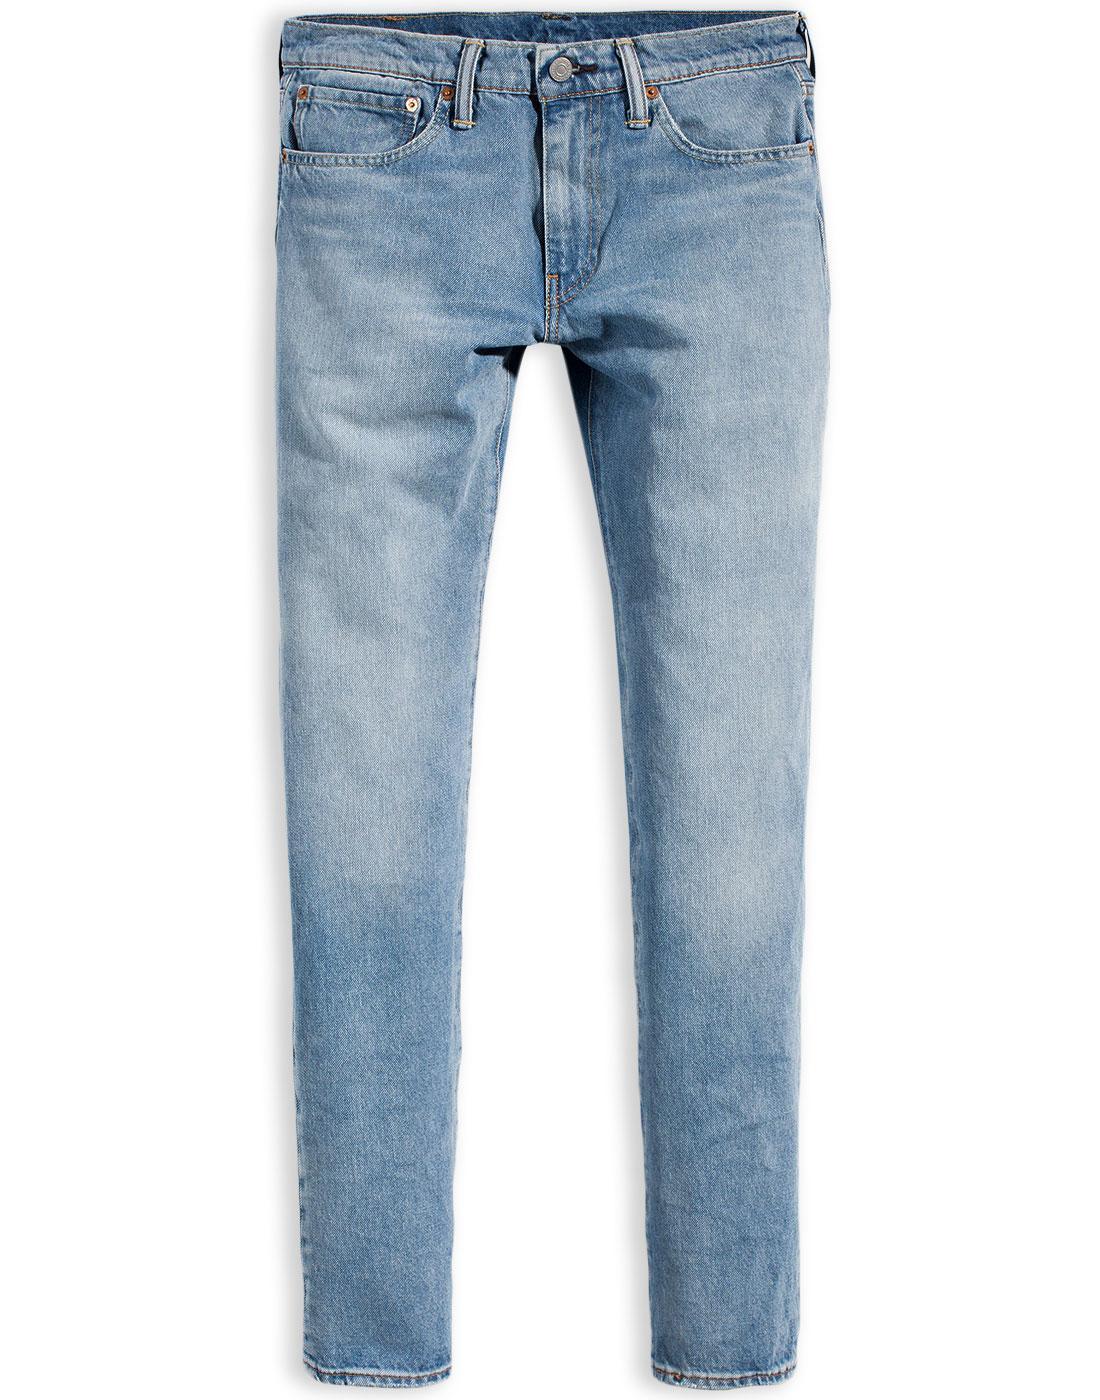 0901e5bc5a39 LEVI'S 511 Retro Warp Stretch Denim Jeans in Ocean Parkway